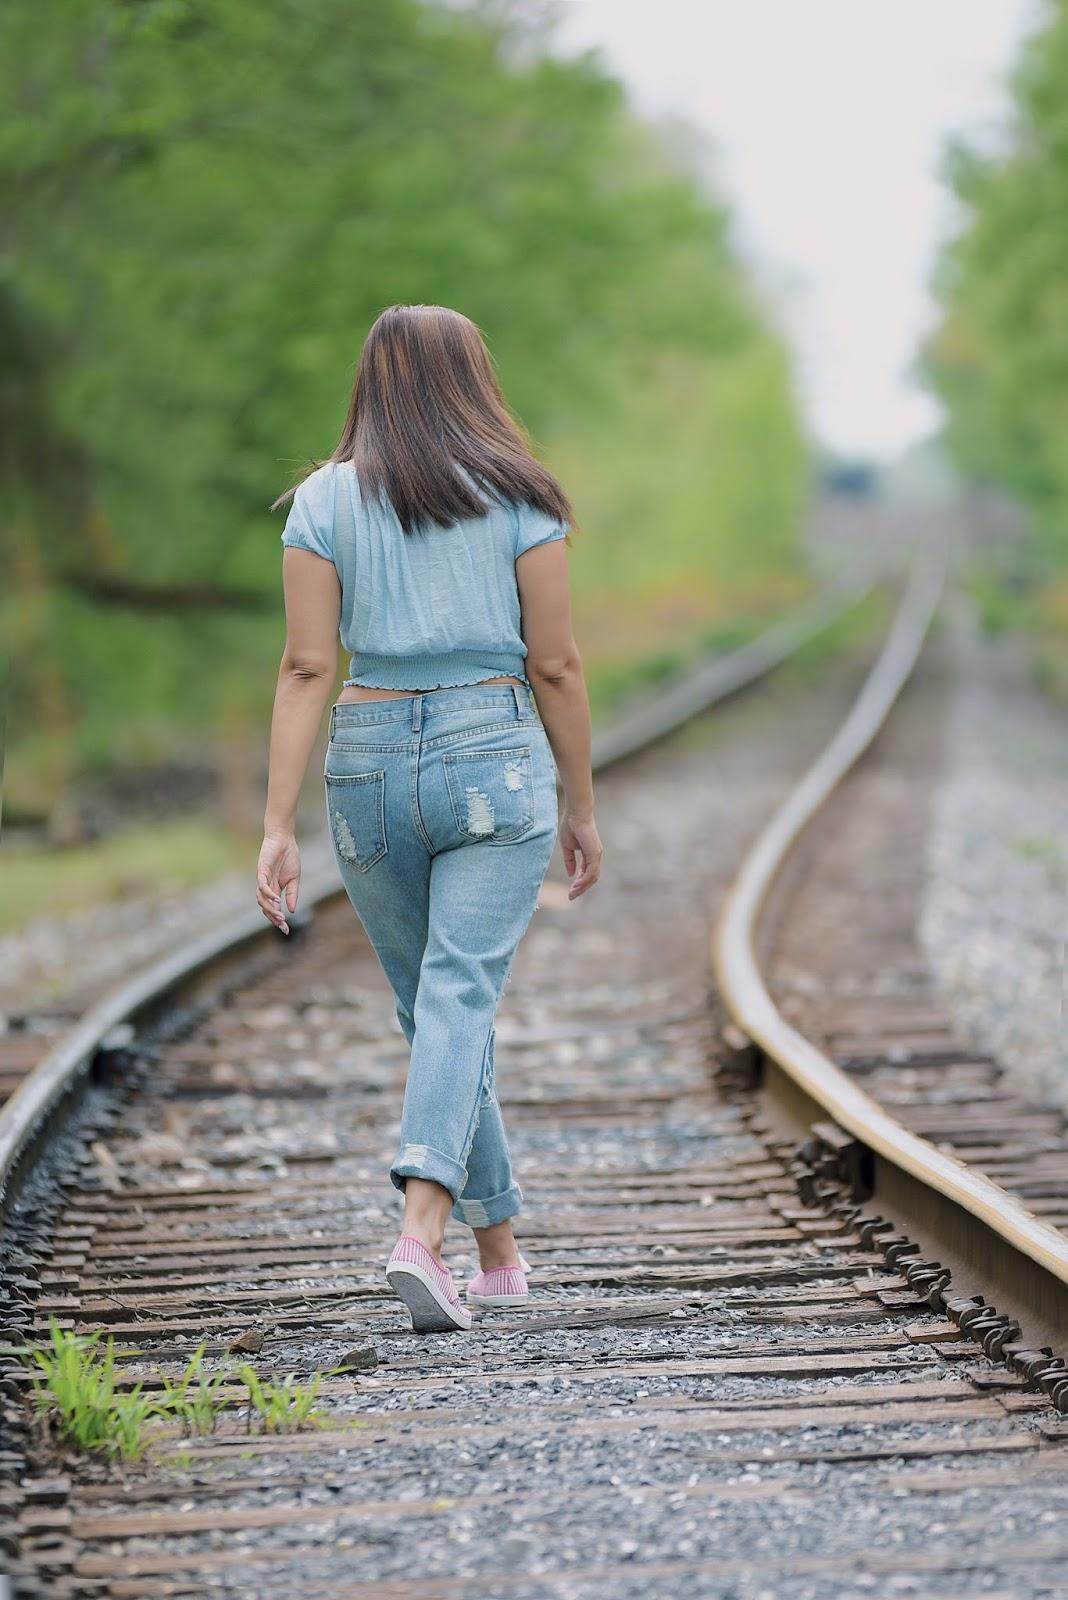 Distressed Boyfriend Jeans-look of the day-mariestilo-travelblogger-mariestilo travels-fashionblogger-it girl-armandhugon-shein-boyfriend jeans-walmart shoes-moda el salvador-content creator